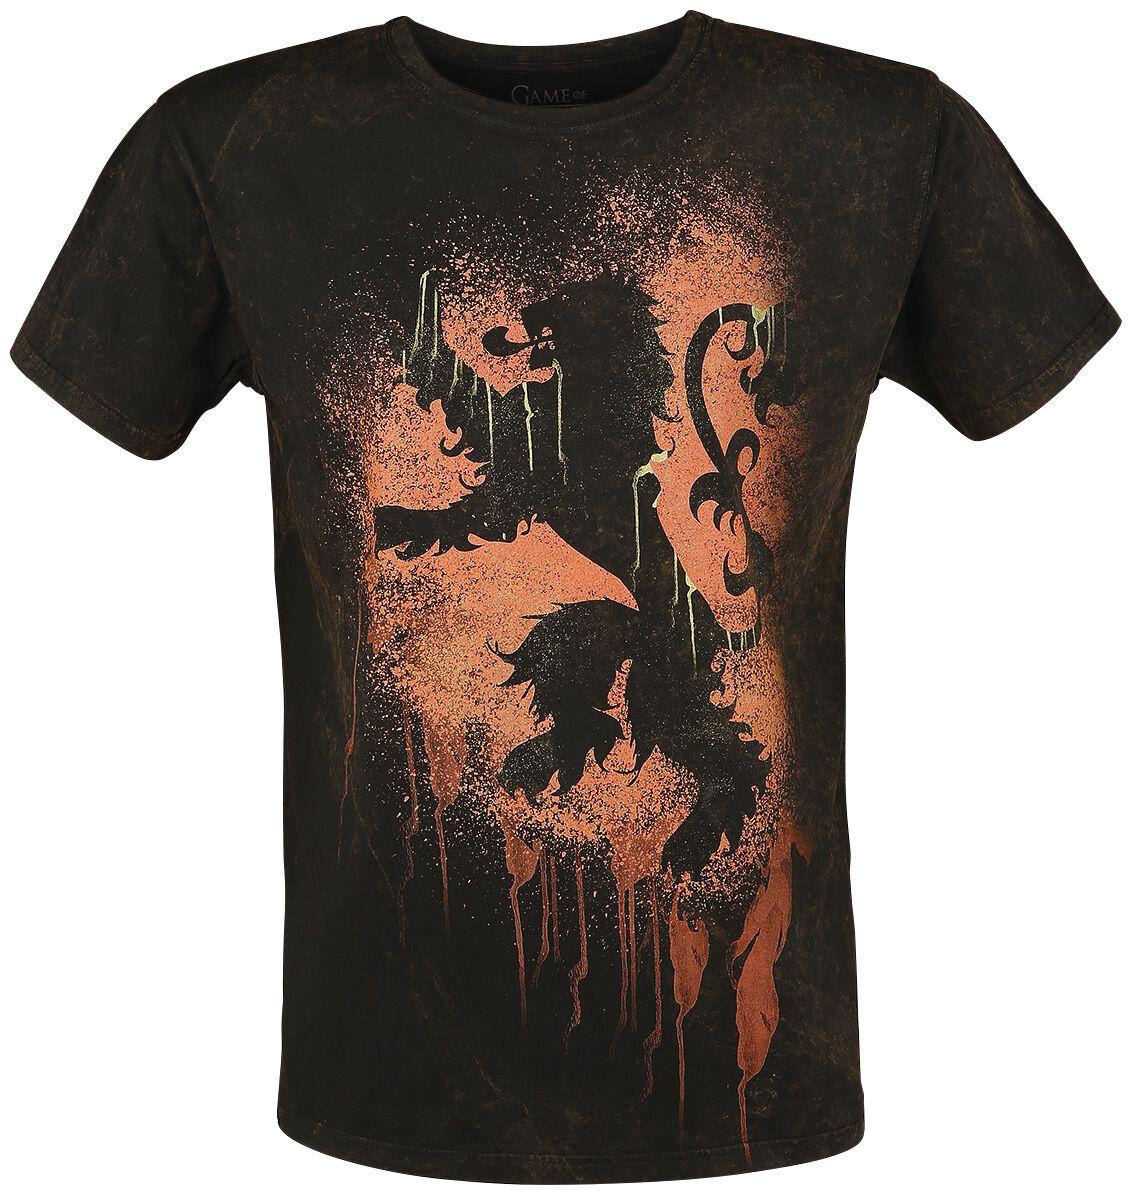 Image of   Game Of Thrones Lannister Graffiti T-Shirt brun-sort